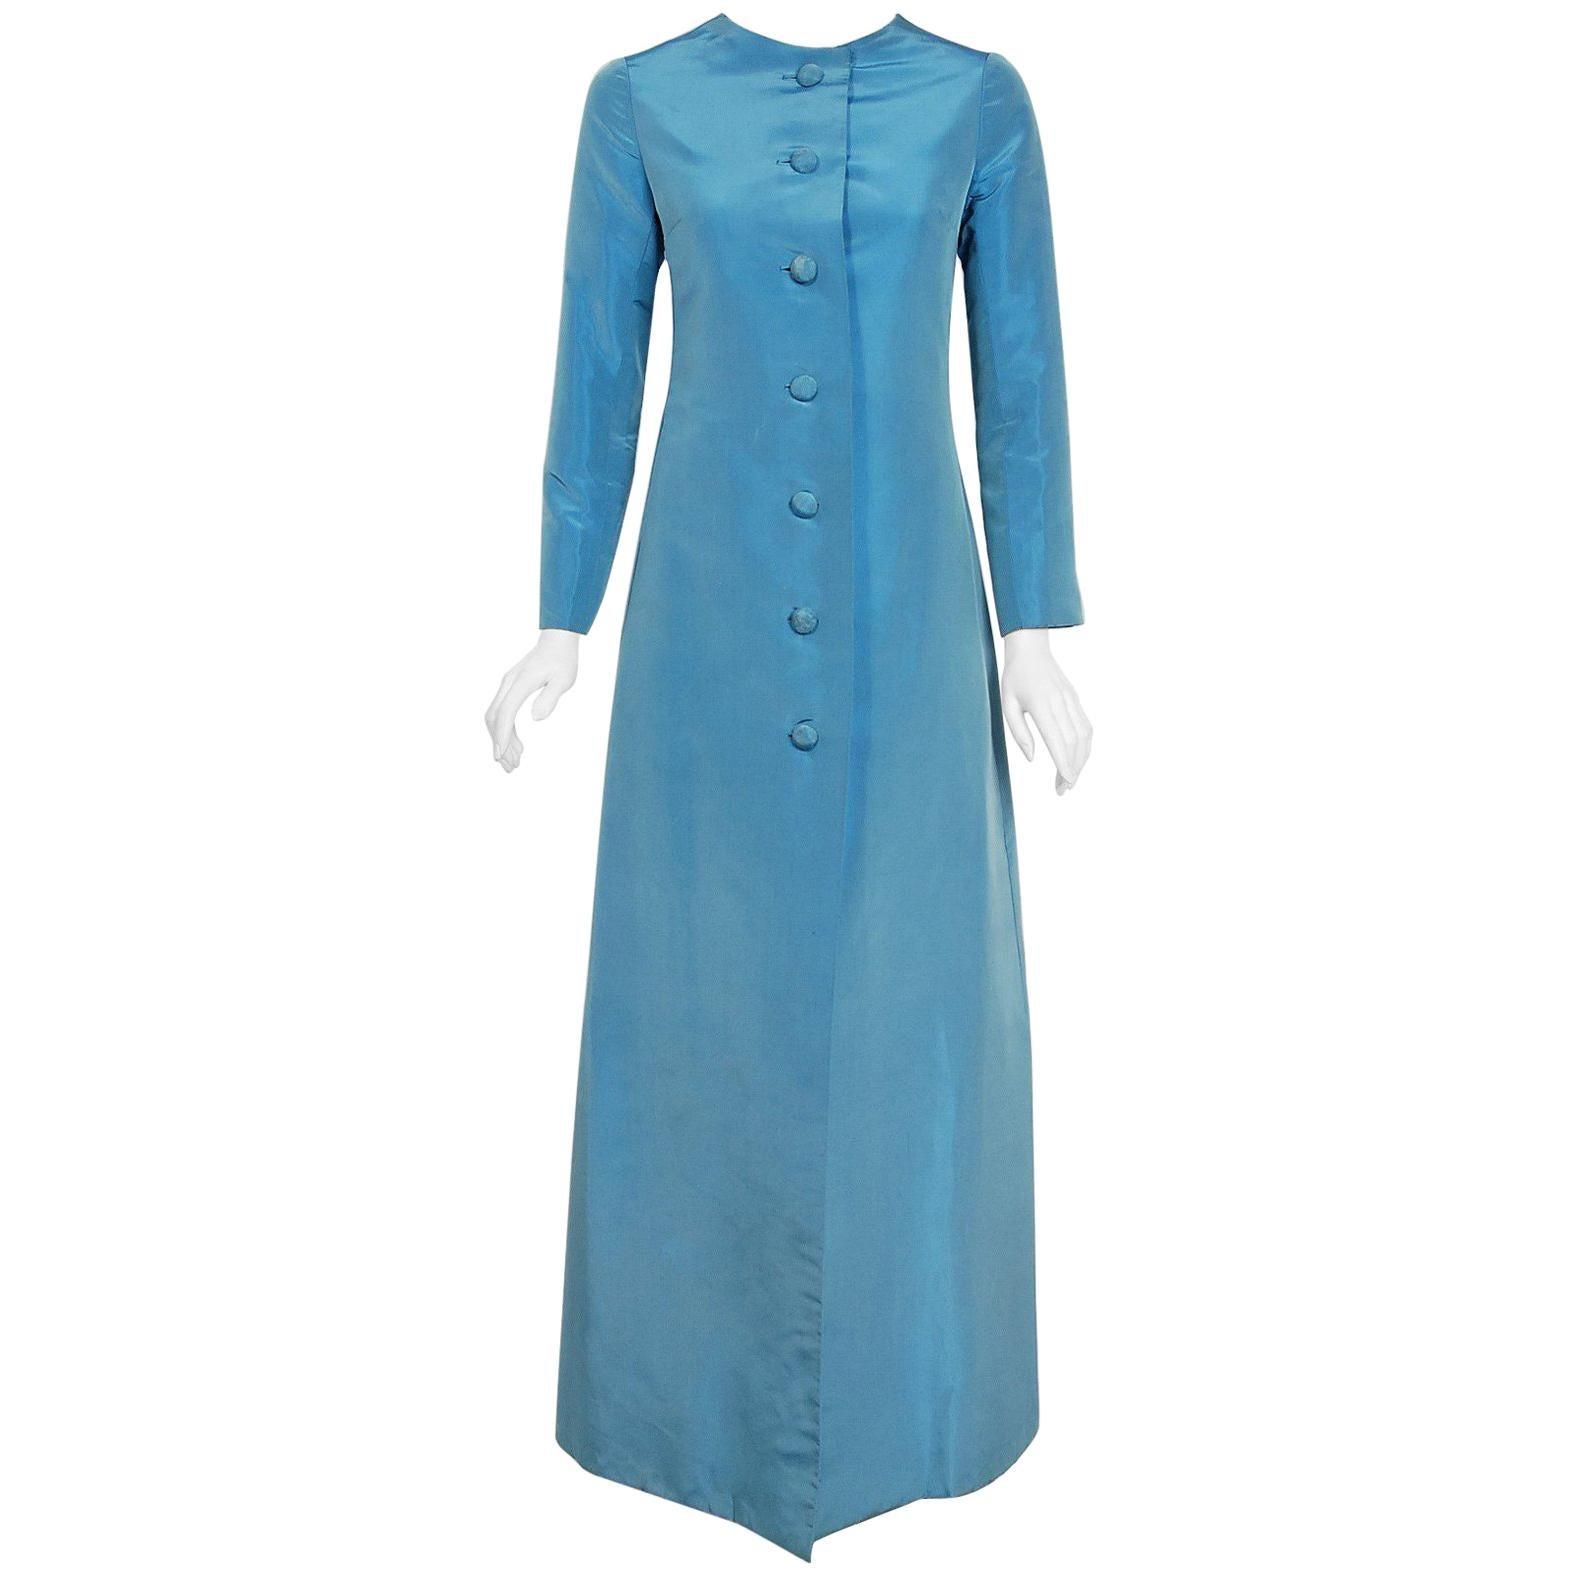 1d1d416fd48 Vintage Christian Dior Clothing - 874 For Sale at 1stdibs